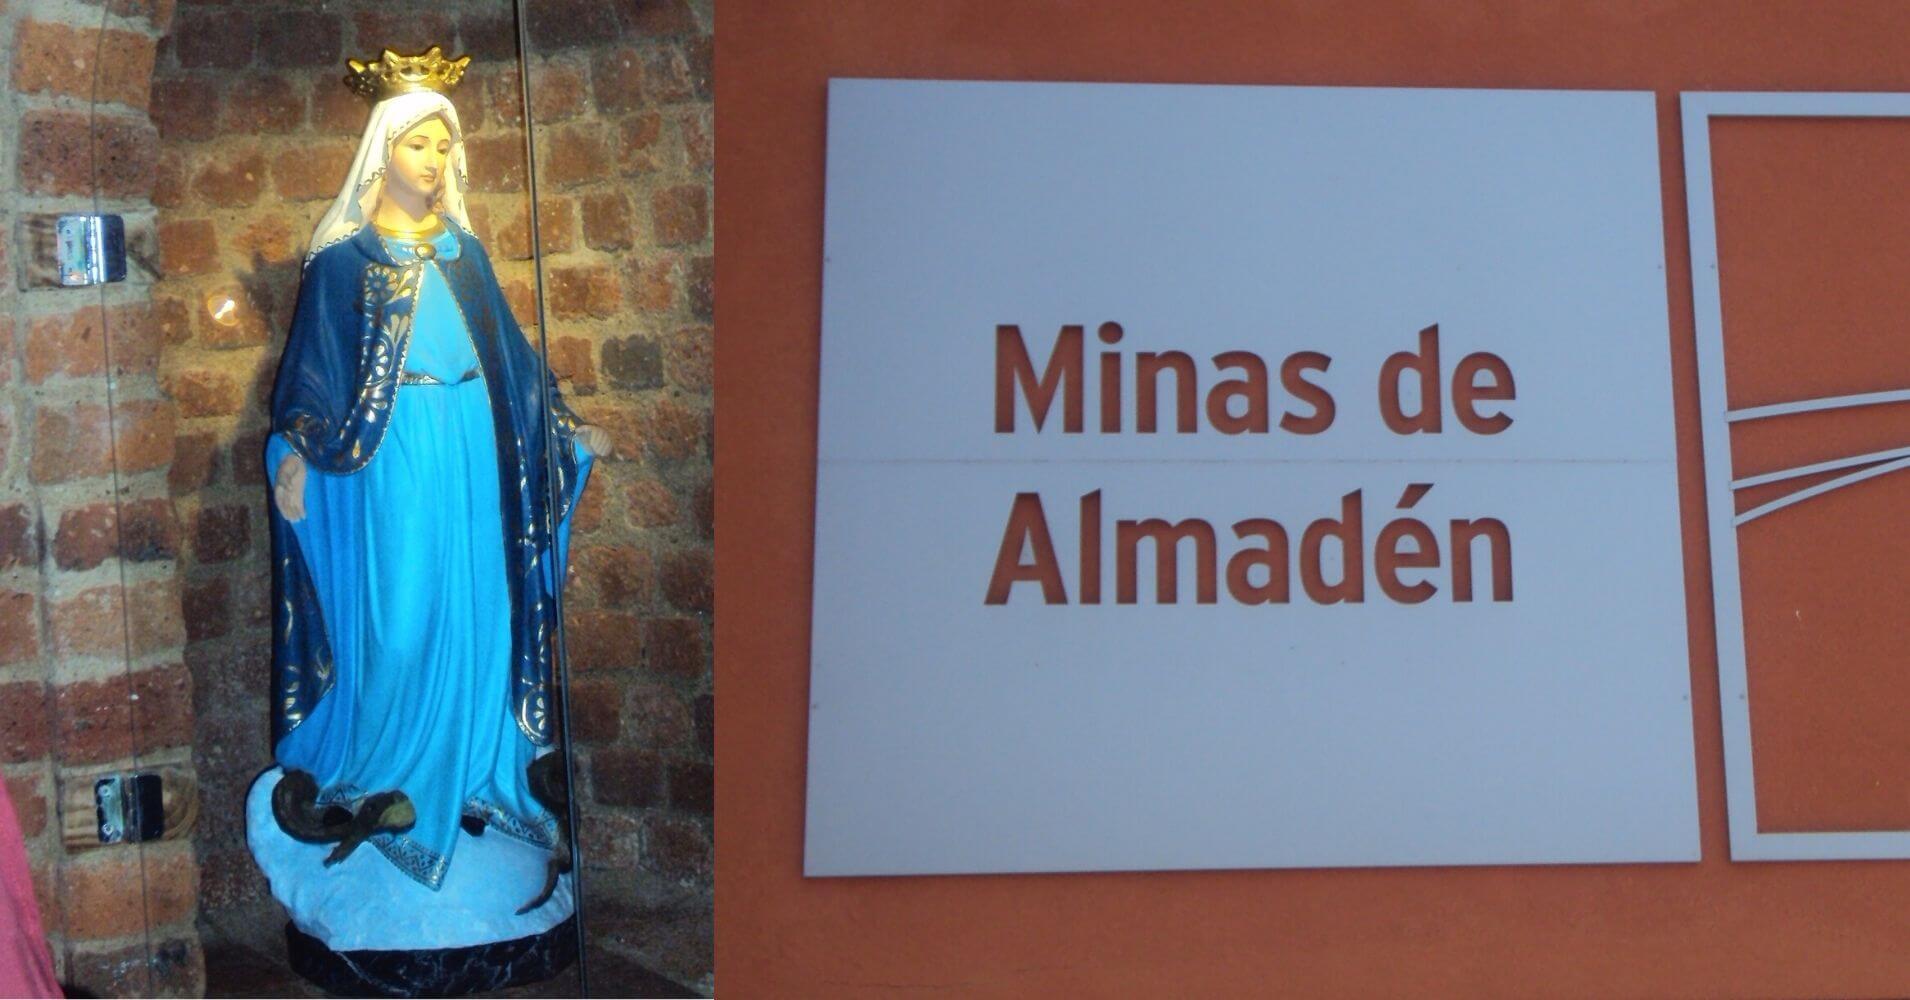 Virgen de la Mina Medalla Milagrosa. Minas de Alamadén. Ciuadad Real. Castilla la Mancha.